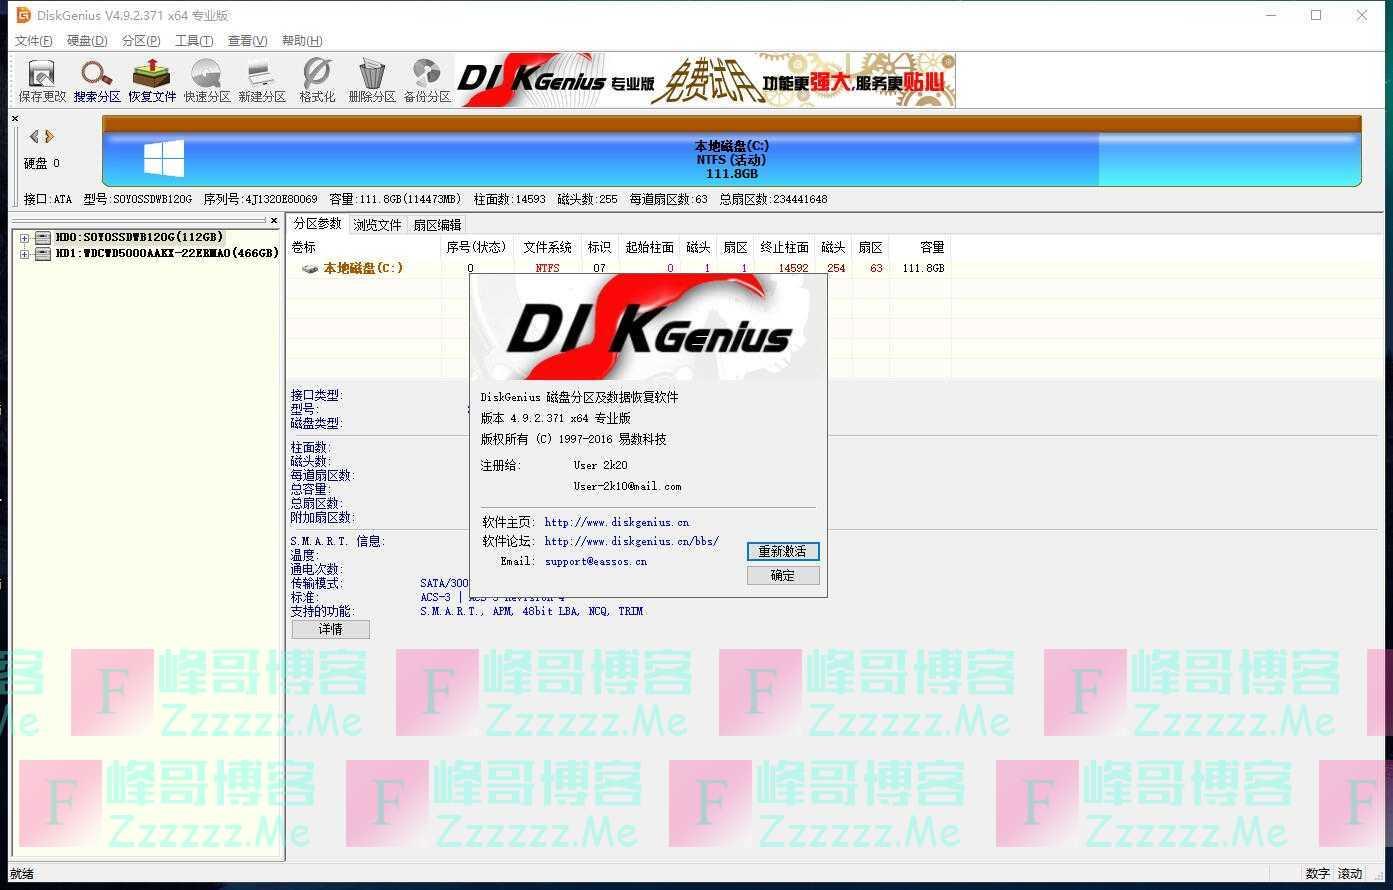 DiskGenius V4.9.2.371 DiskGenius最新Pro专业破解版下载